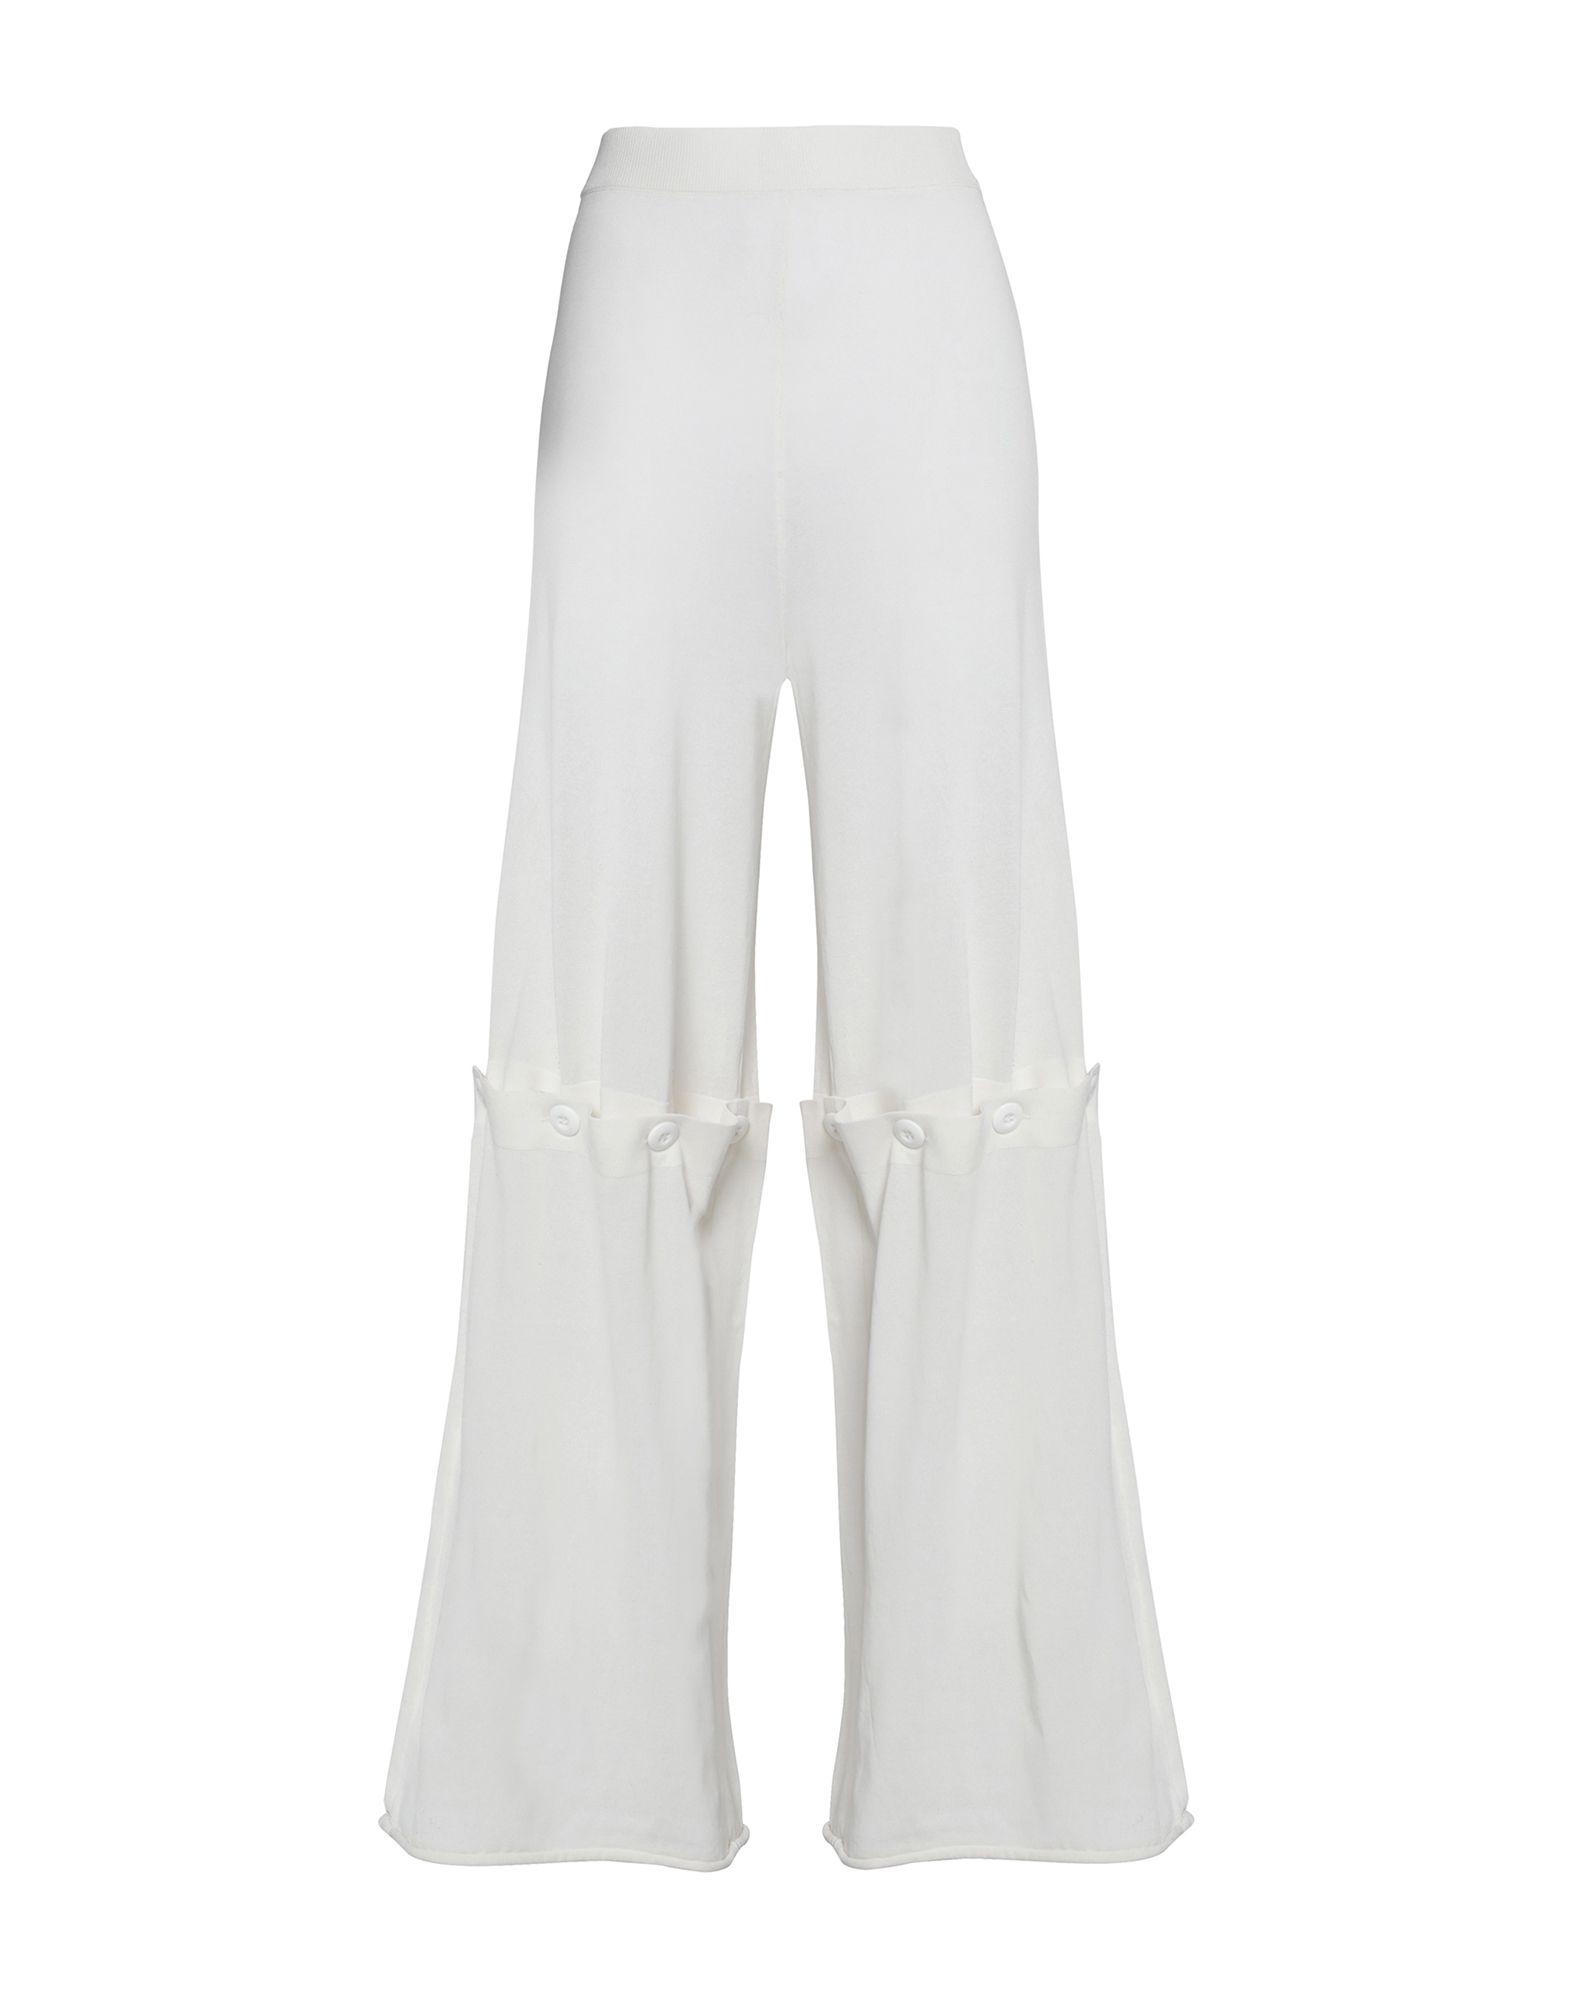 Pantalone Mm6 Maison Margiela damen - 13285314CT